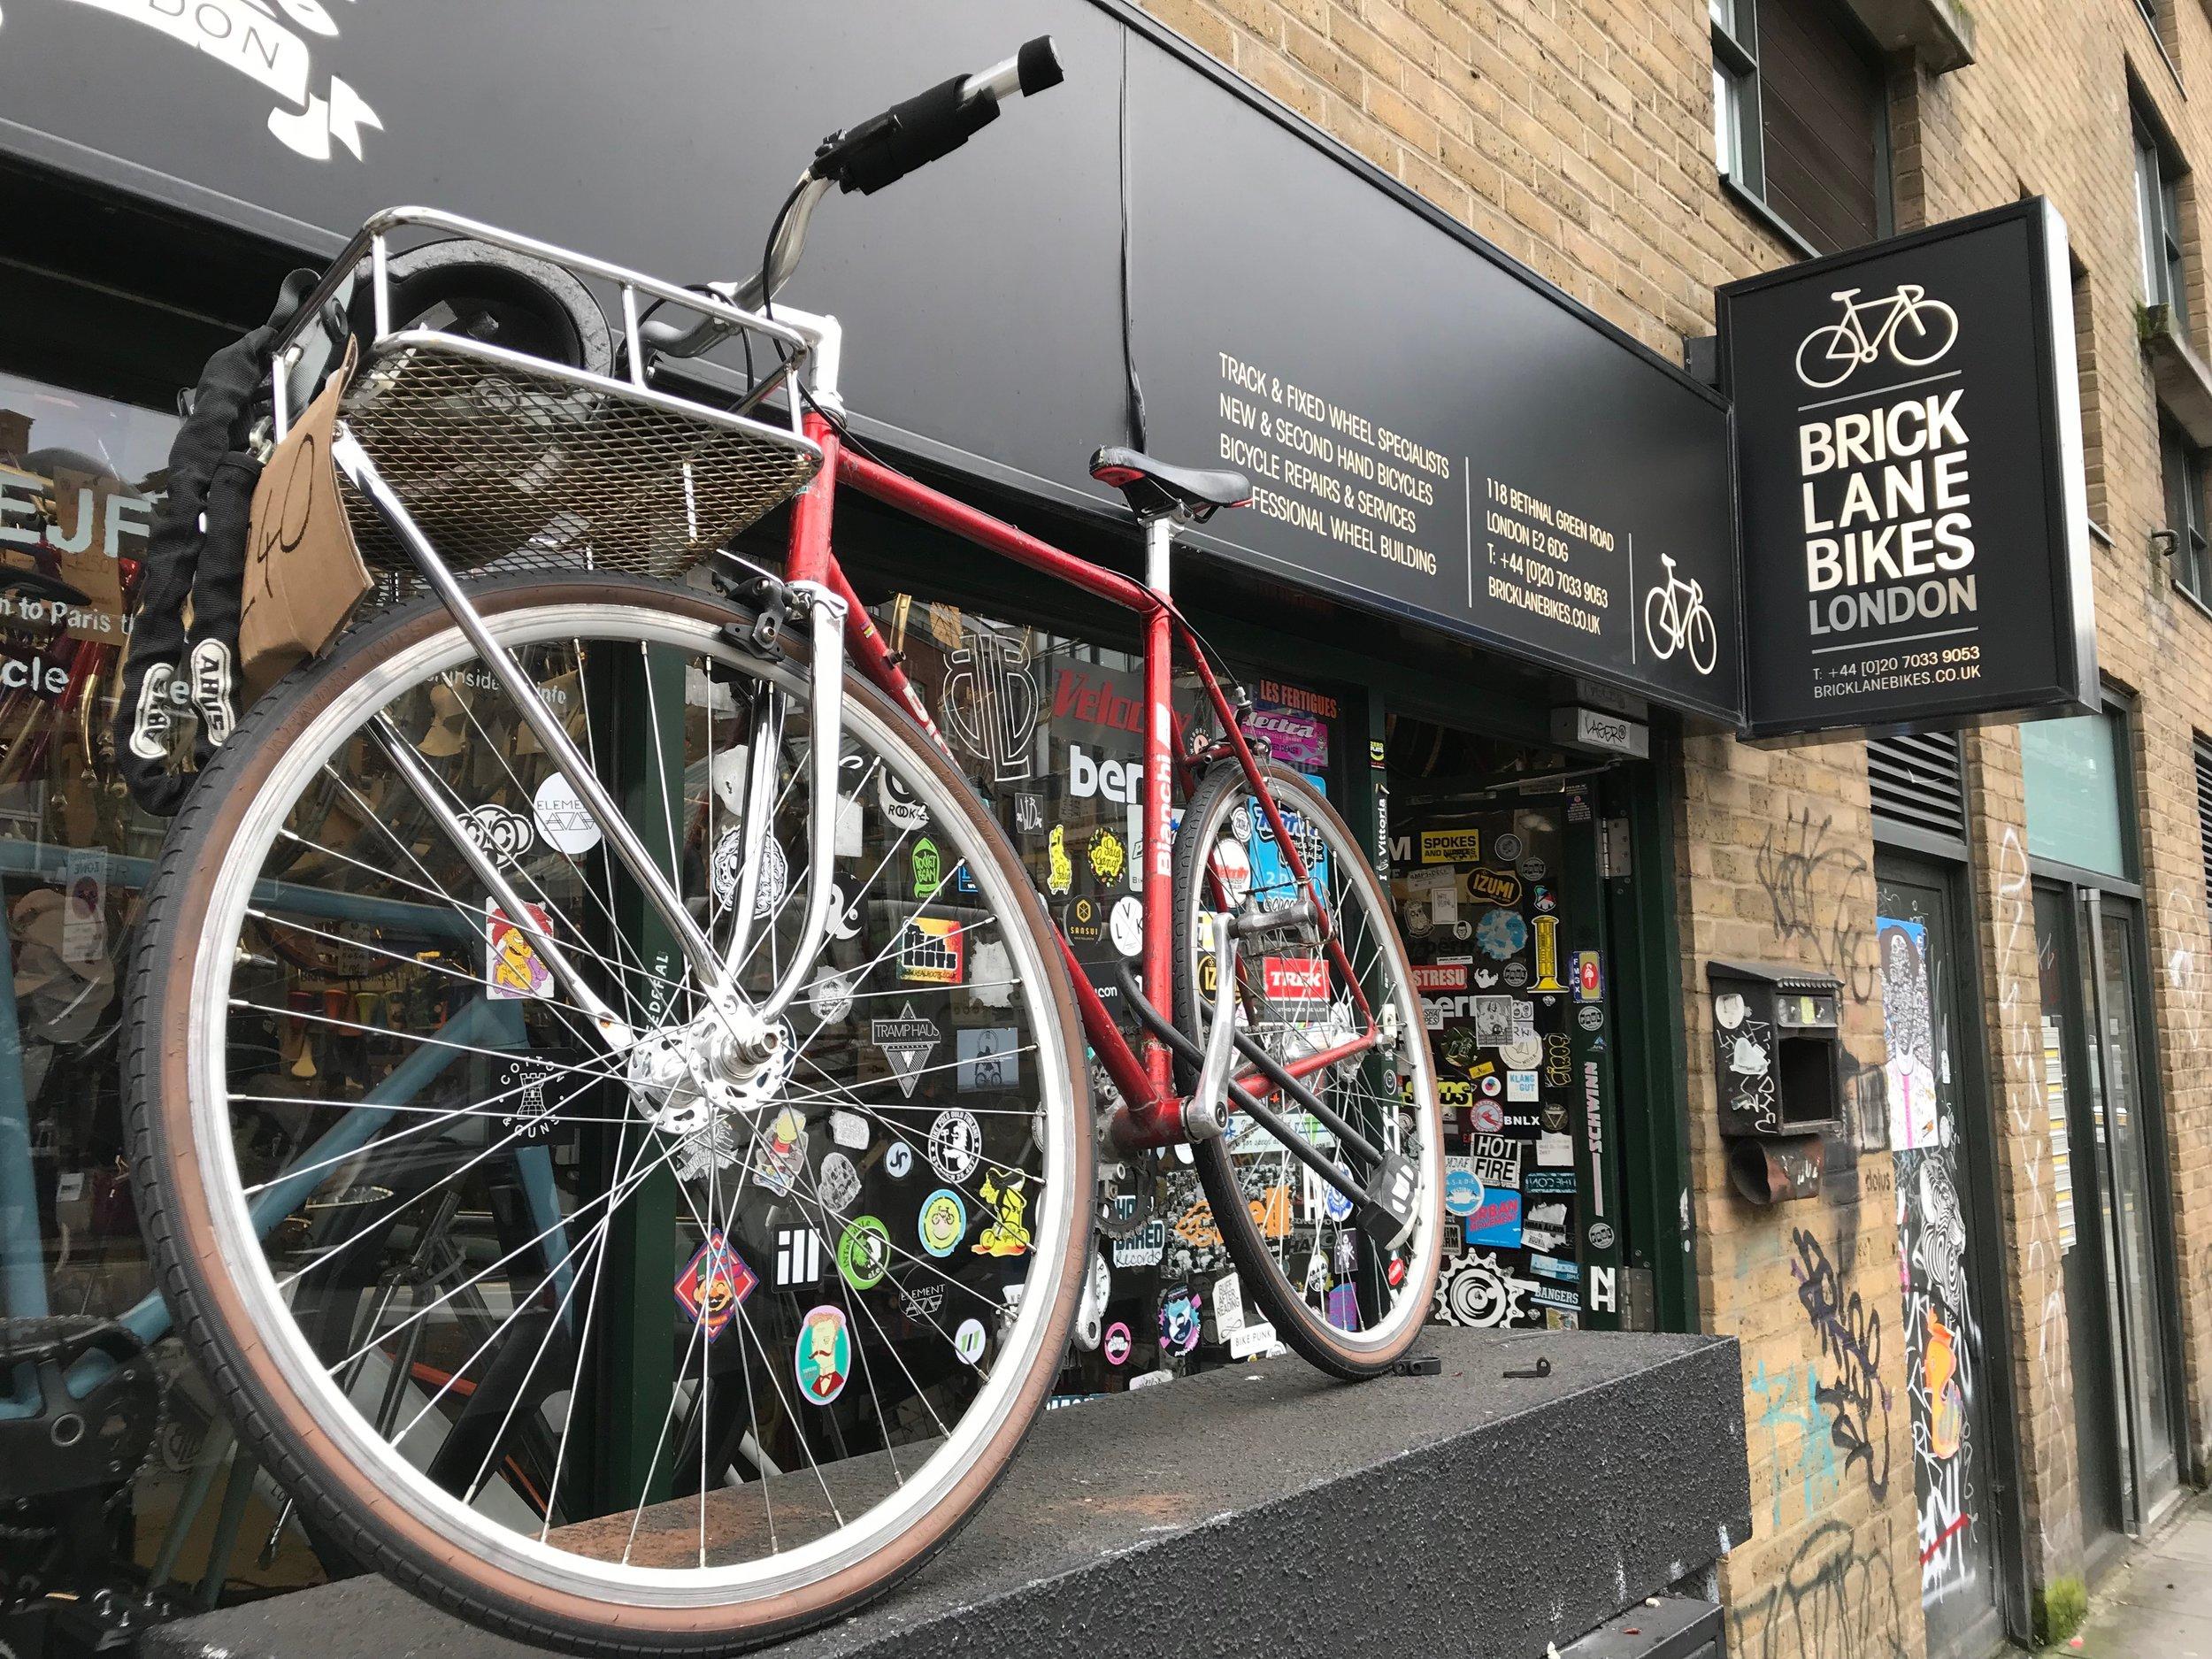 28 Jan. 2018. Brick Lane Bikes, London. Proof of cool?